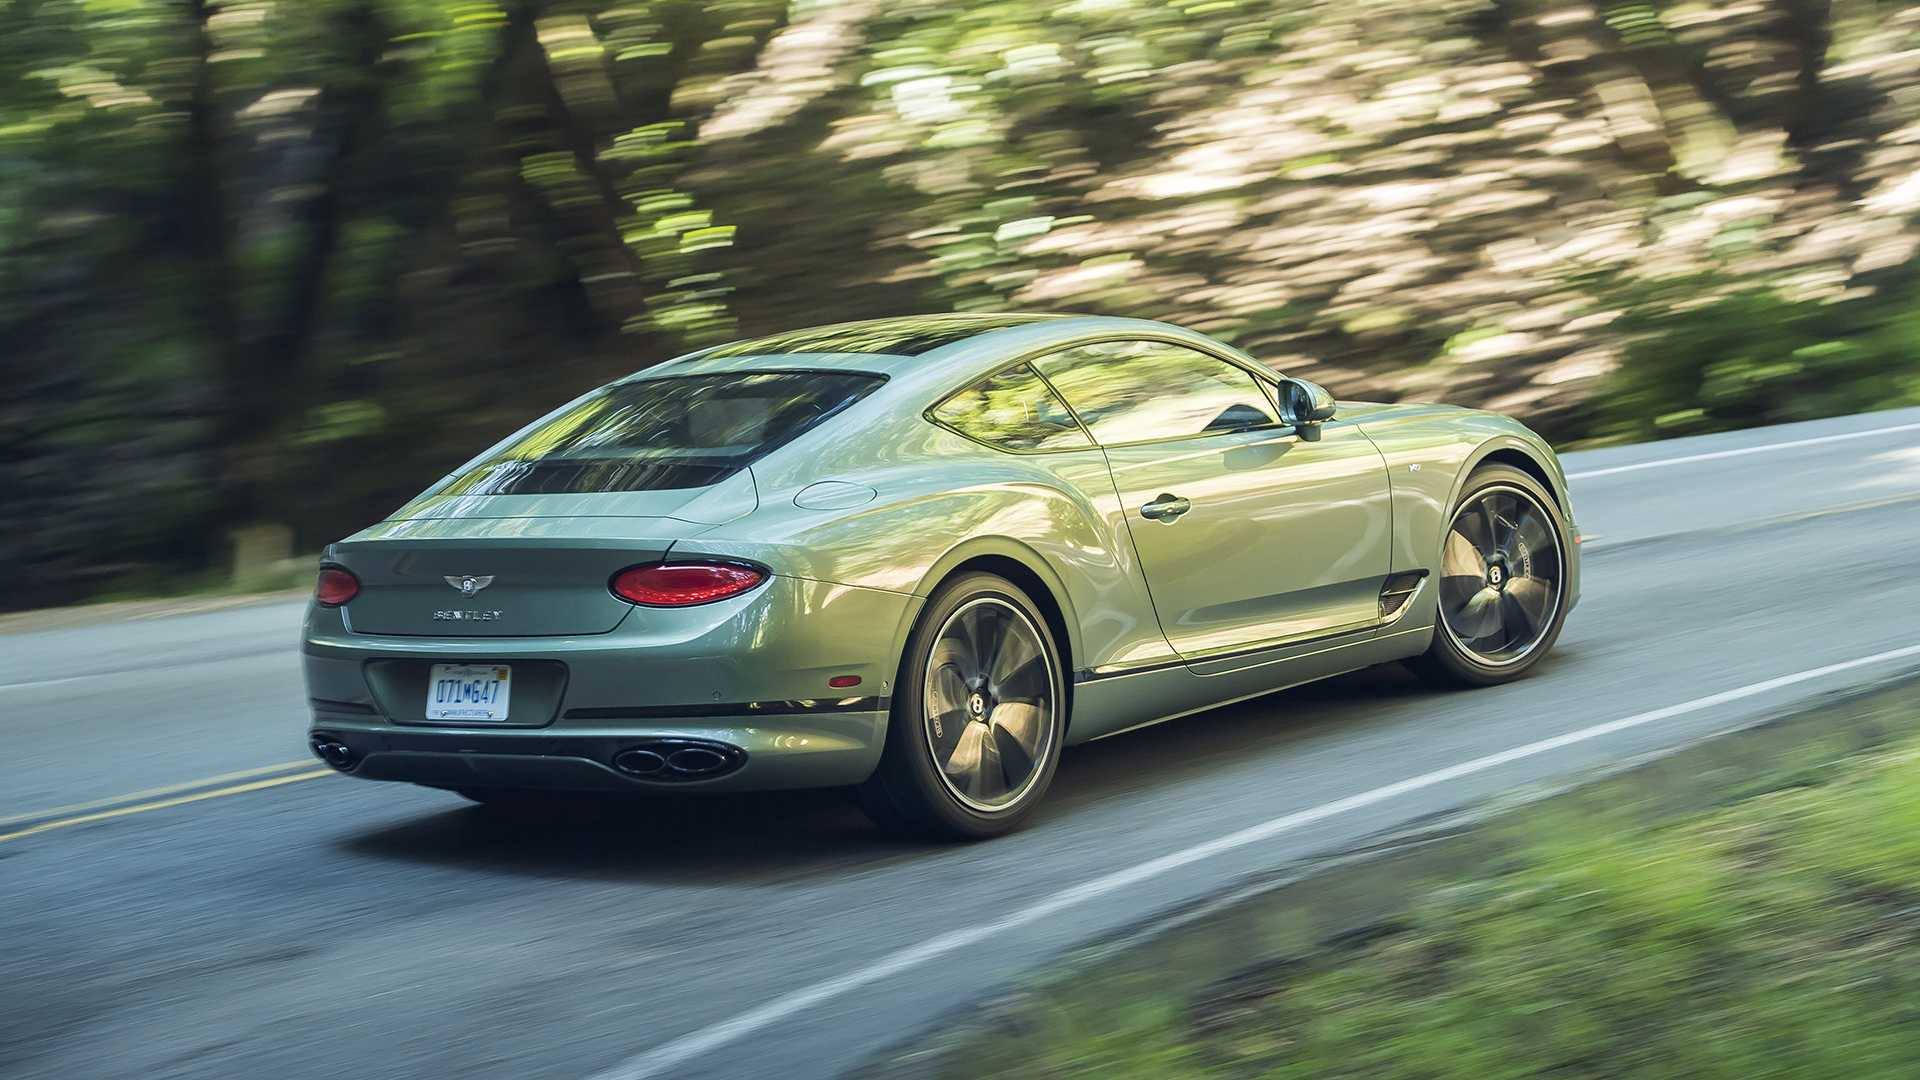 2020 Bentley Continental Gt V8 First Drive A True Bentley